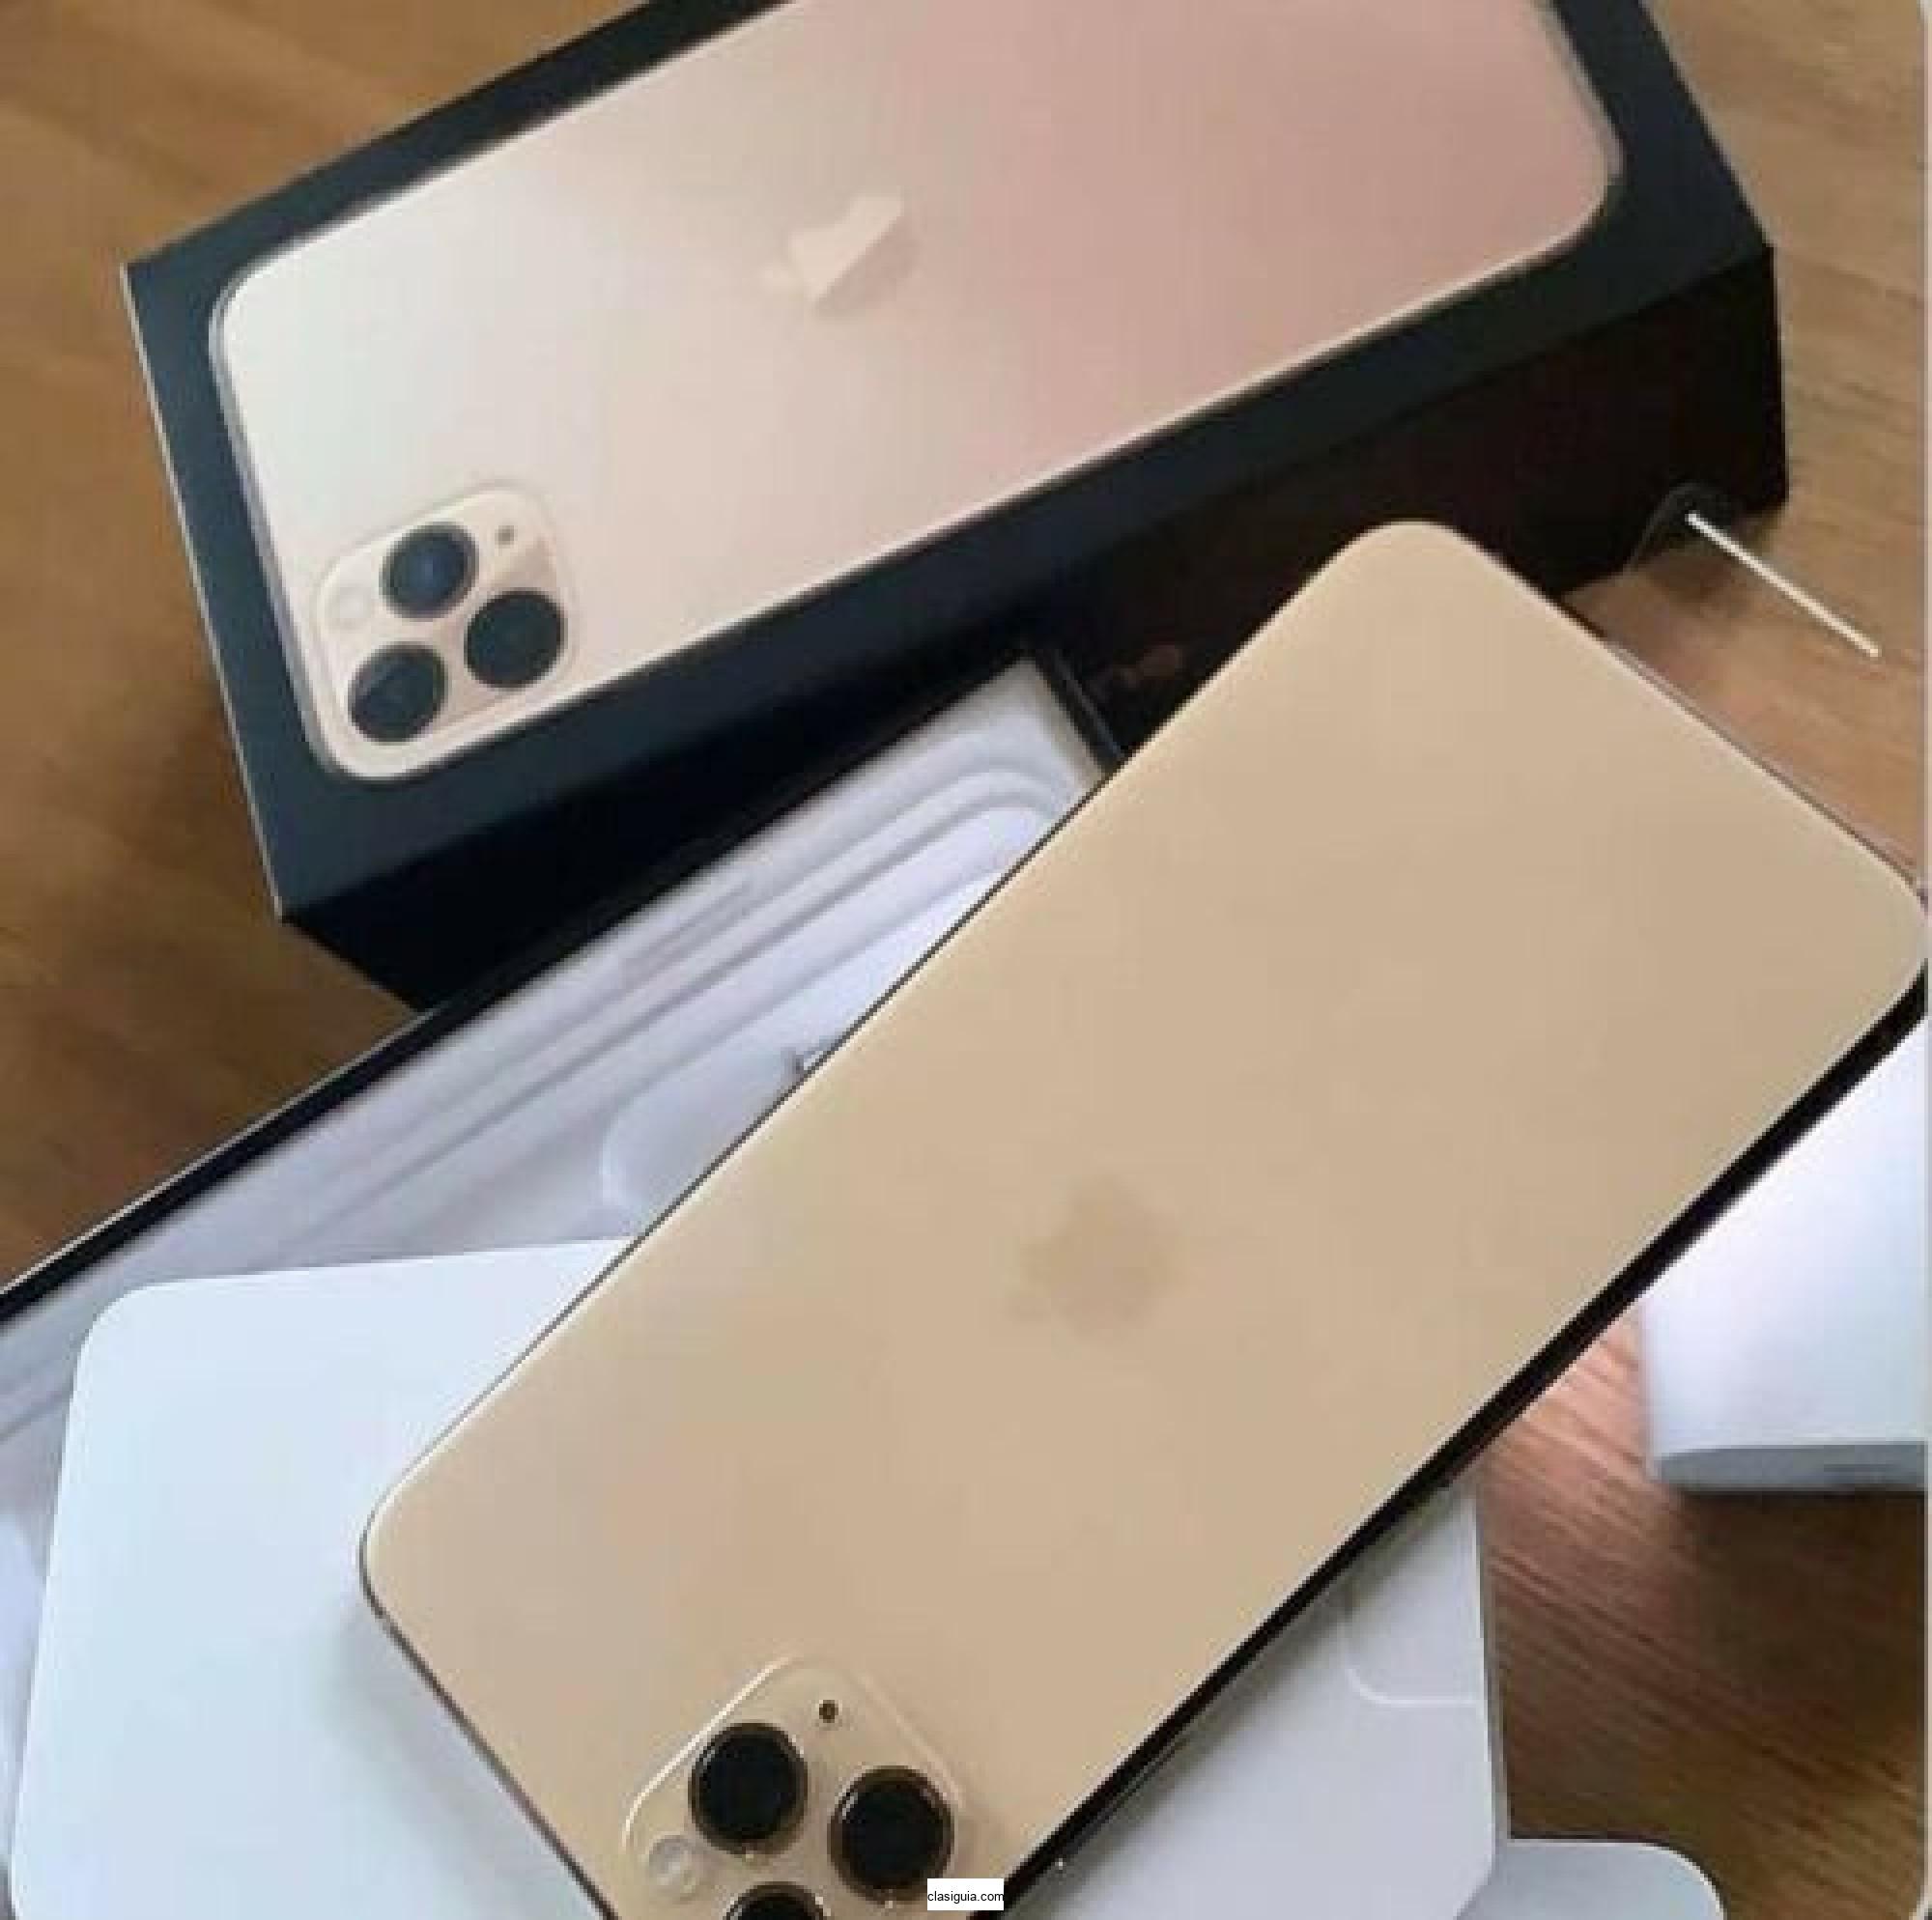 NEW Apple iPhone 11 Pro Max 512GB - Silver - WORLDWIDE Unlocked (CDMA + GSM)